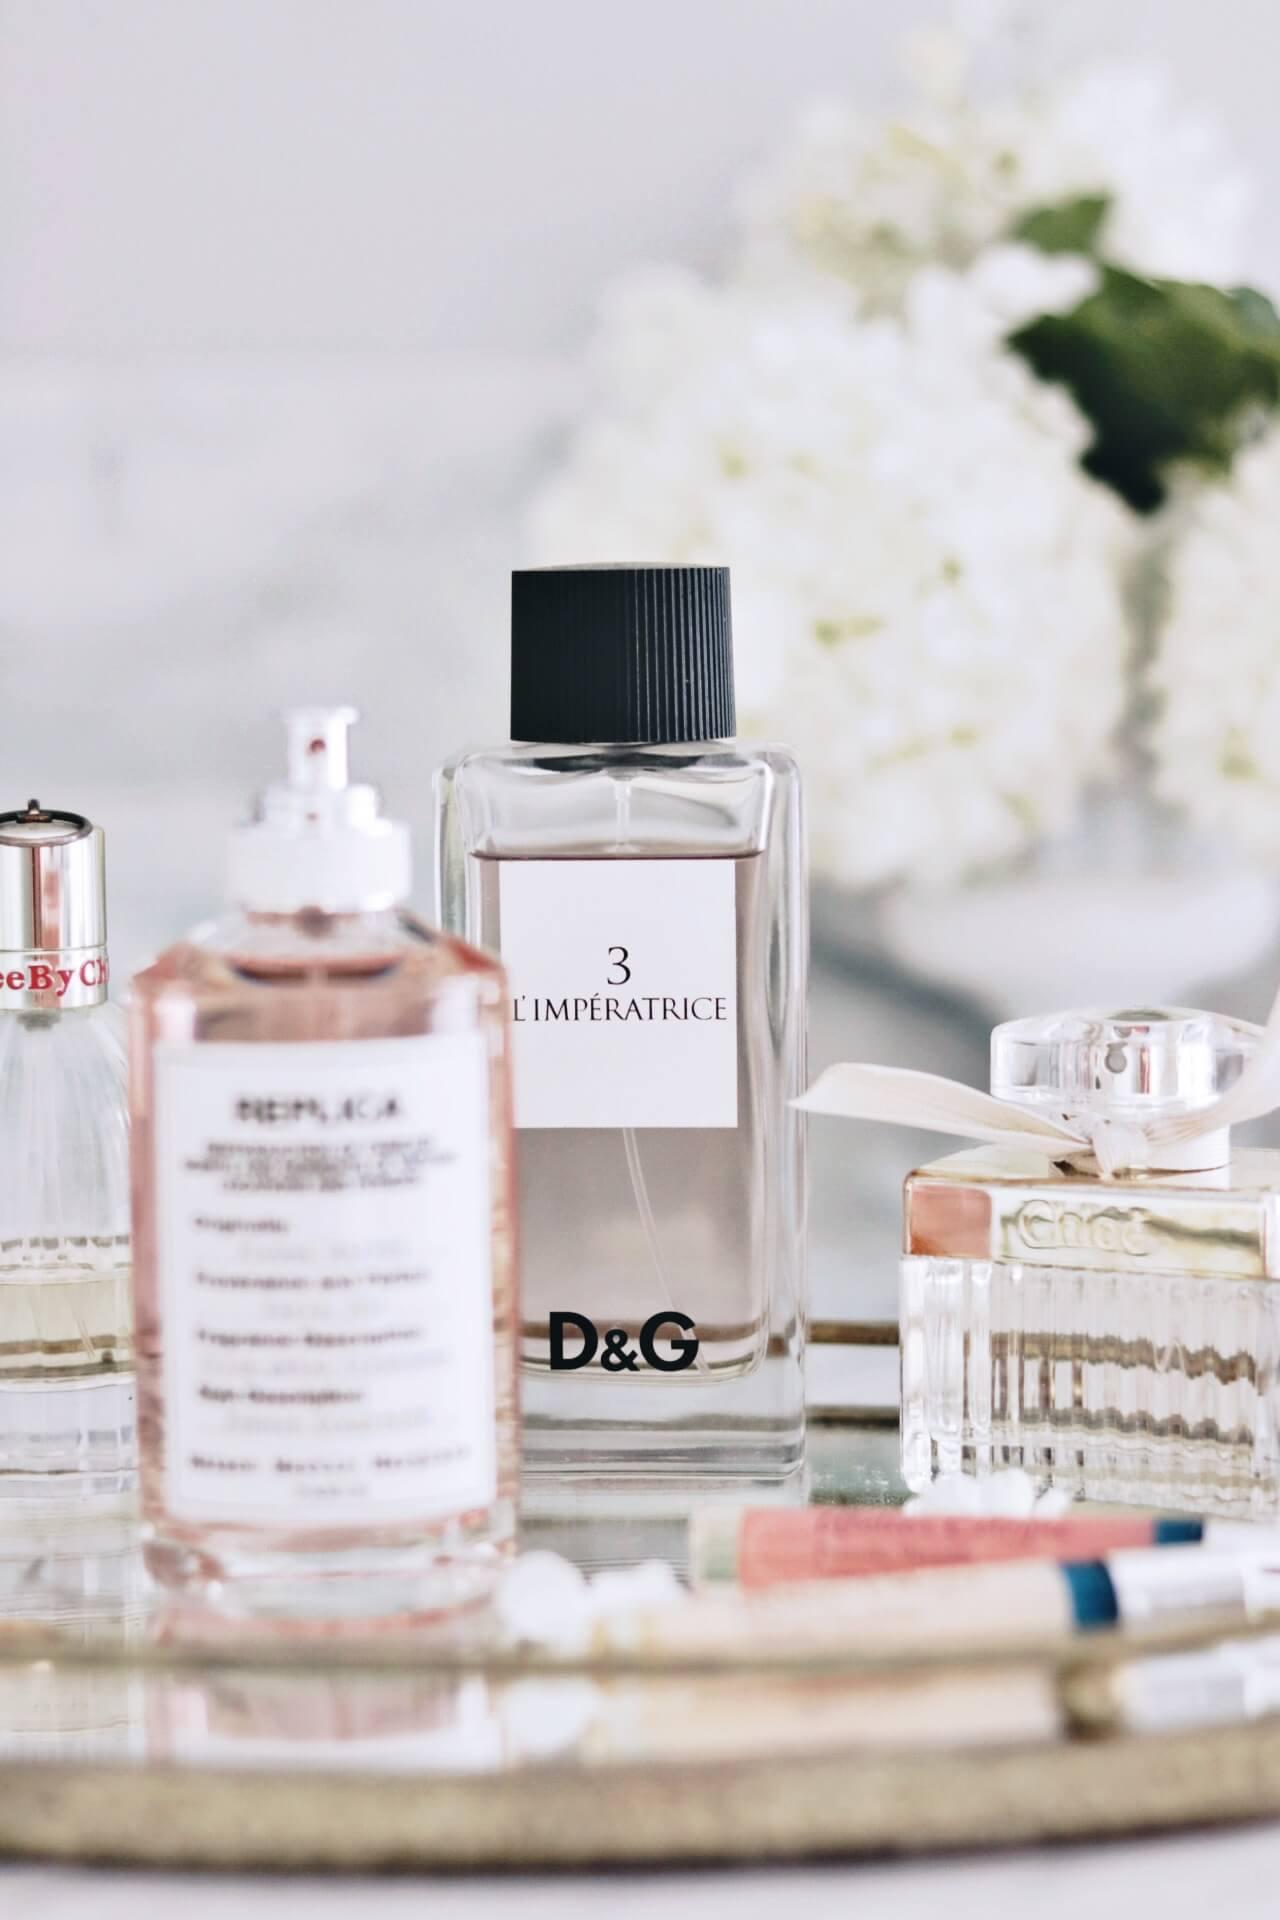 Jillian Harris Cruelty-Free Perfume D&G L'imperatrice